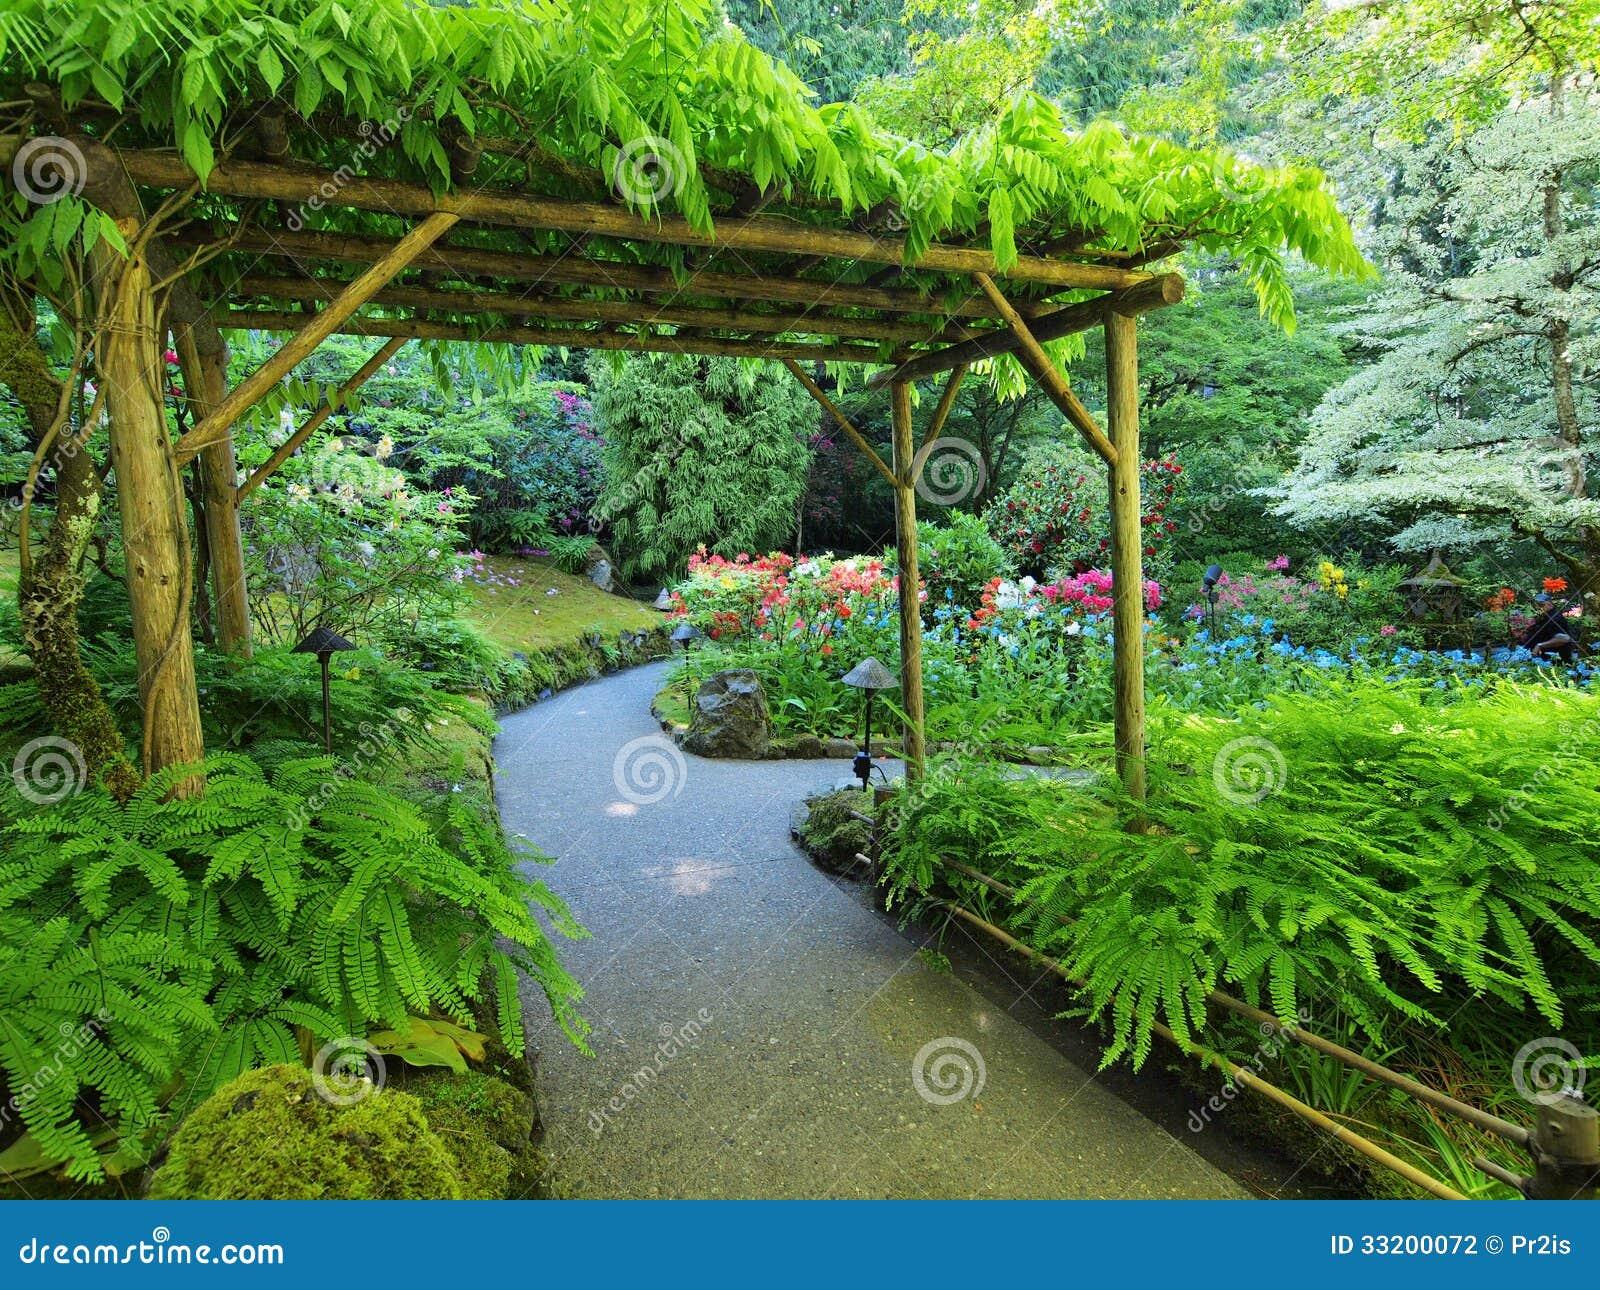 Pergola Over The Garden Walkway Stock Photography Image